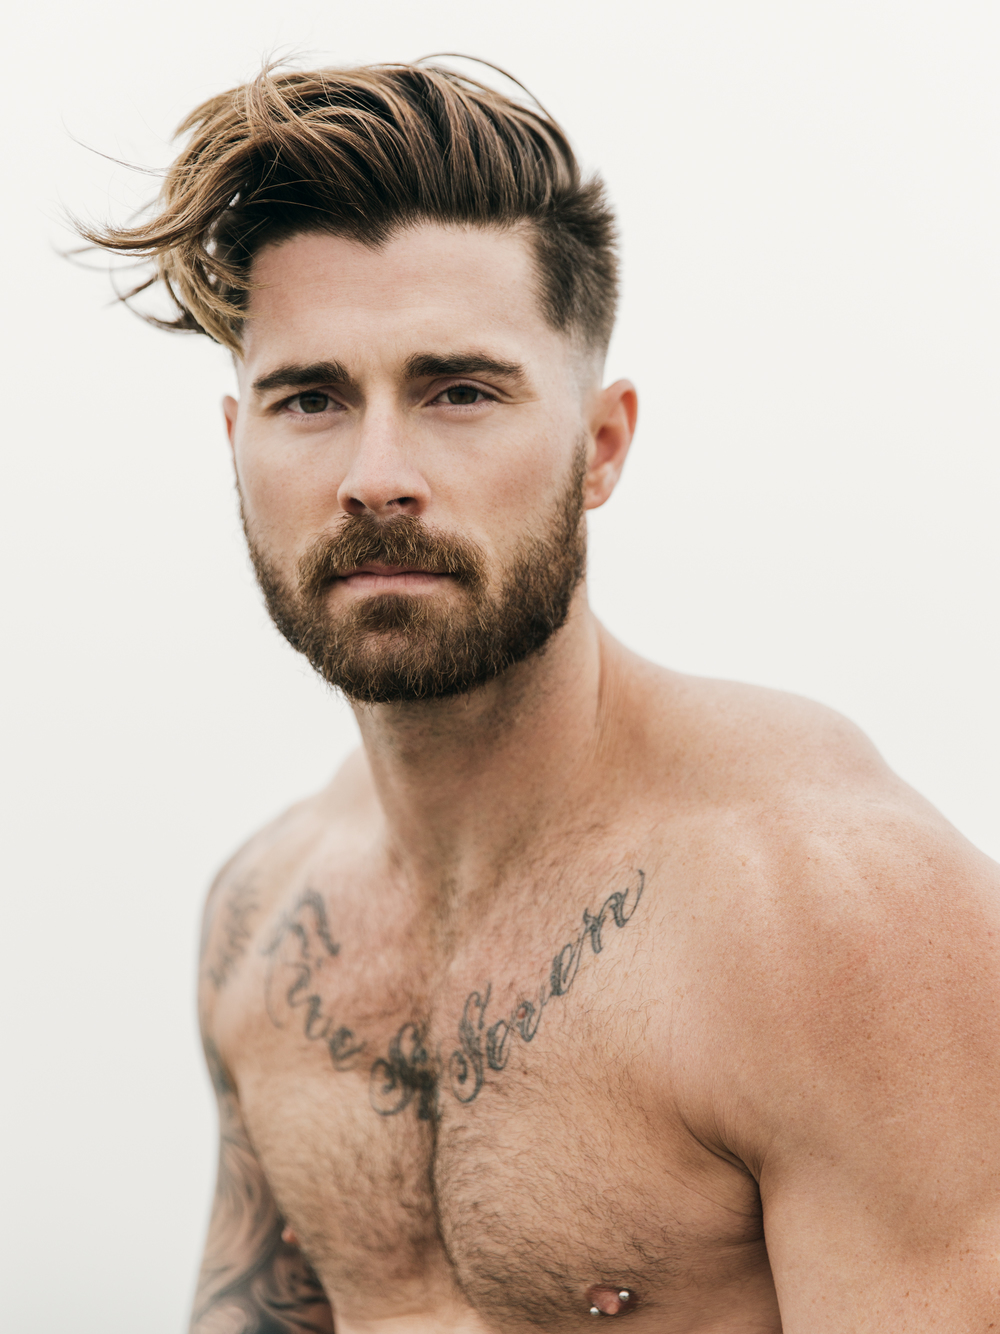 Kyle, 2014